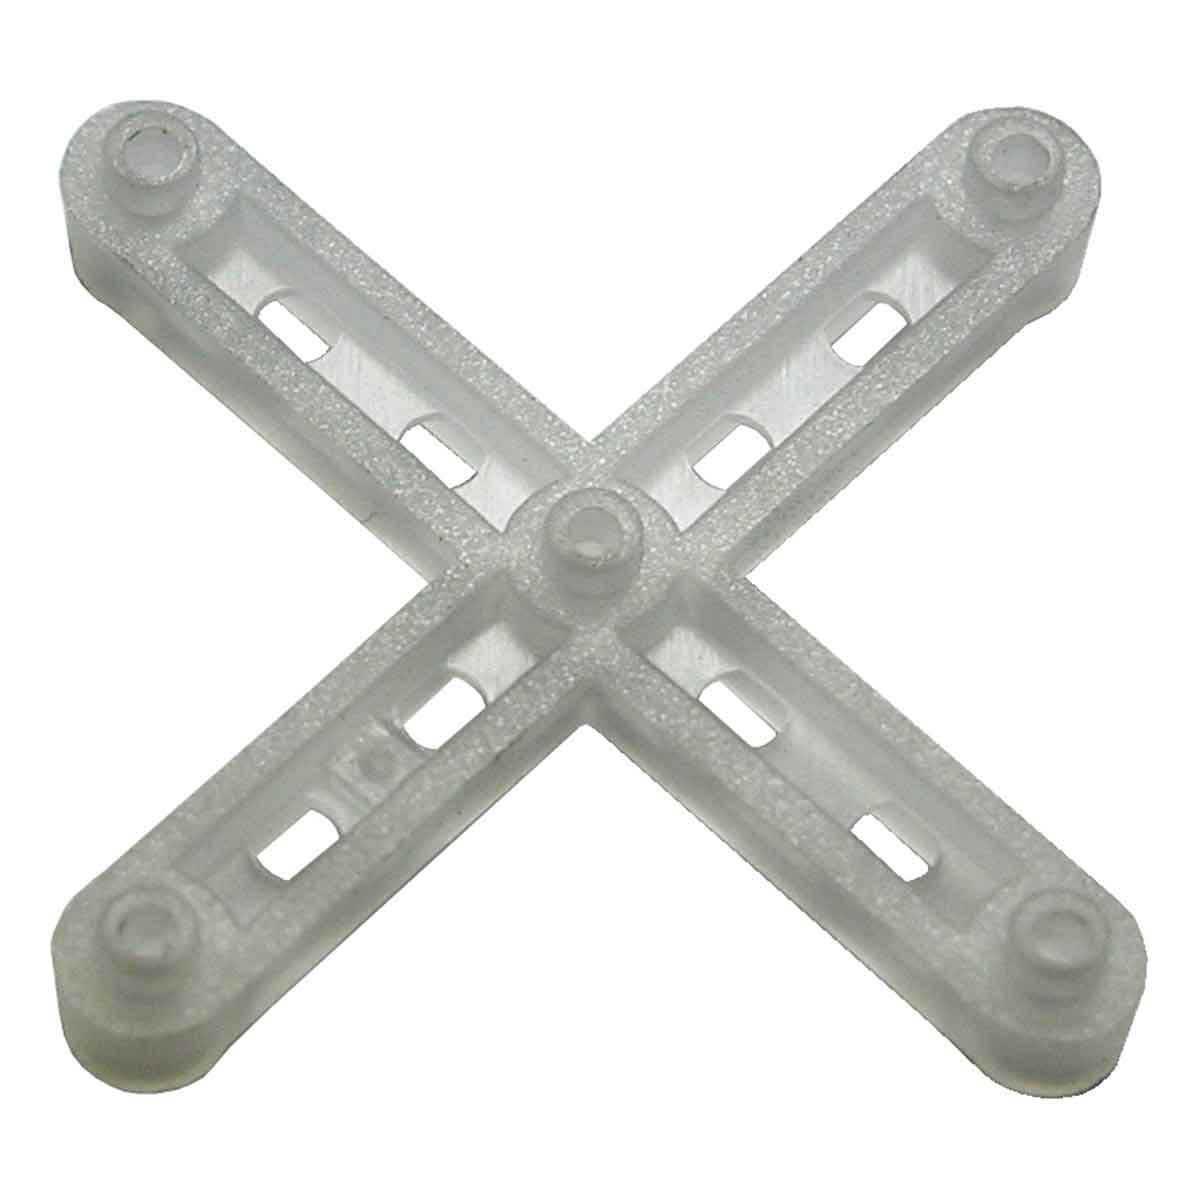 1/4 inch Leave-In Tile Spacers SPC14JAR Gray